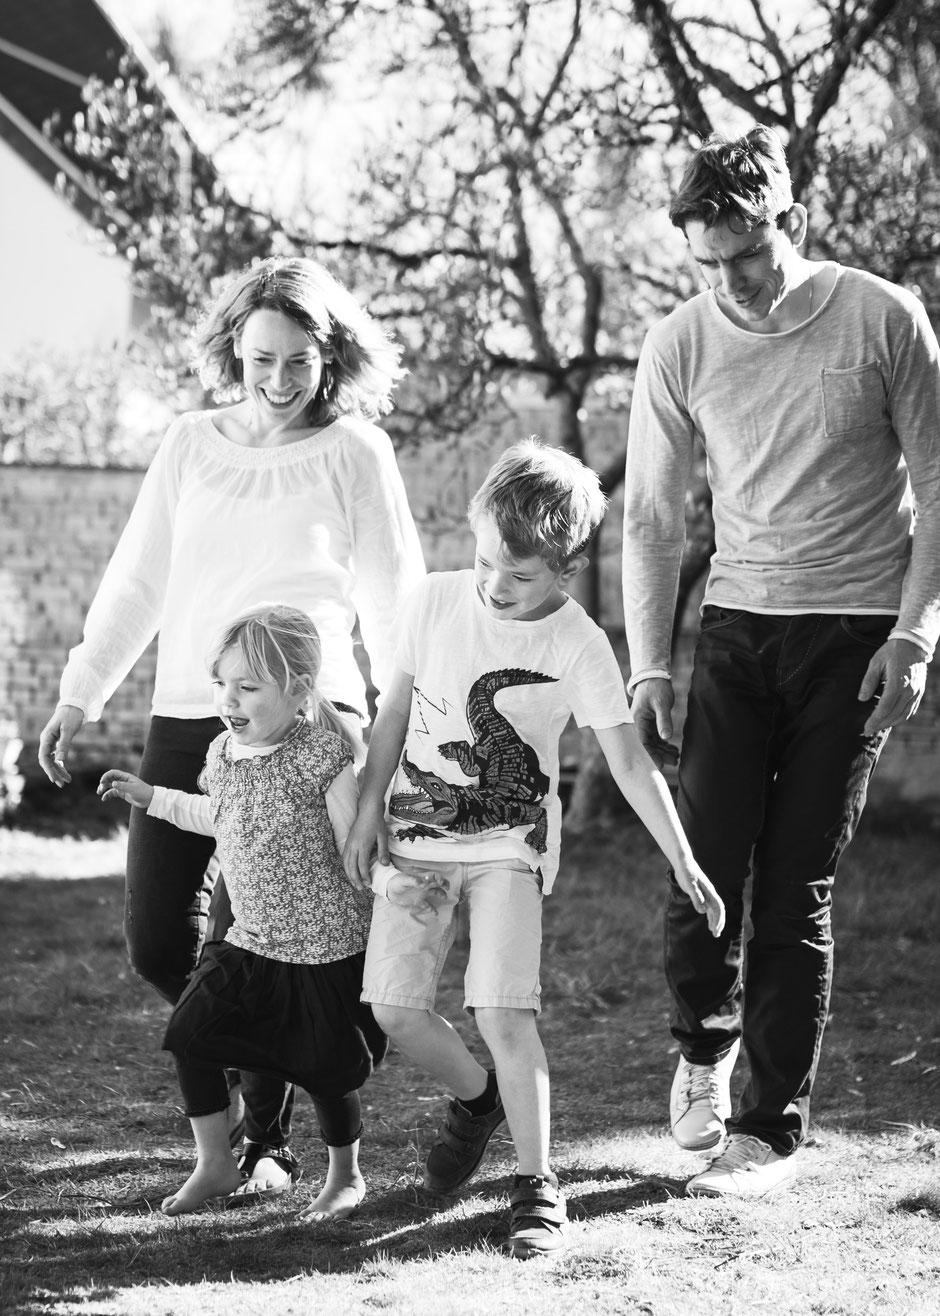 Familienshooting Saarbrücken, Familienfotos Saarbrücken, Familienfotograf Saarbrücken, Familienfotografin Saarbrücken, Familienfotograf Saarland